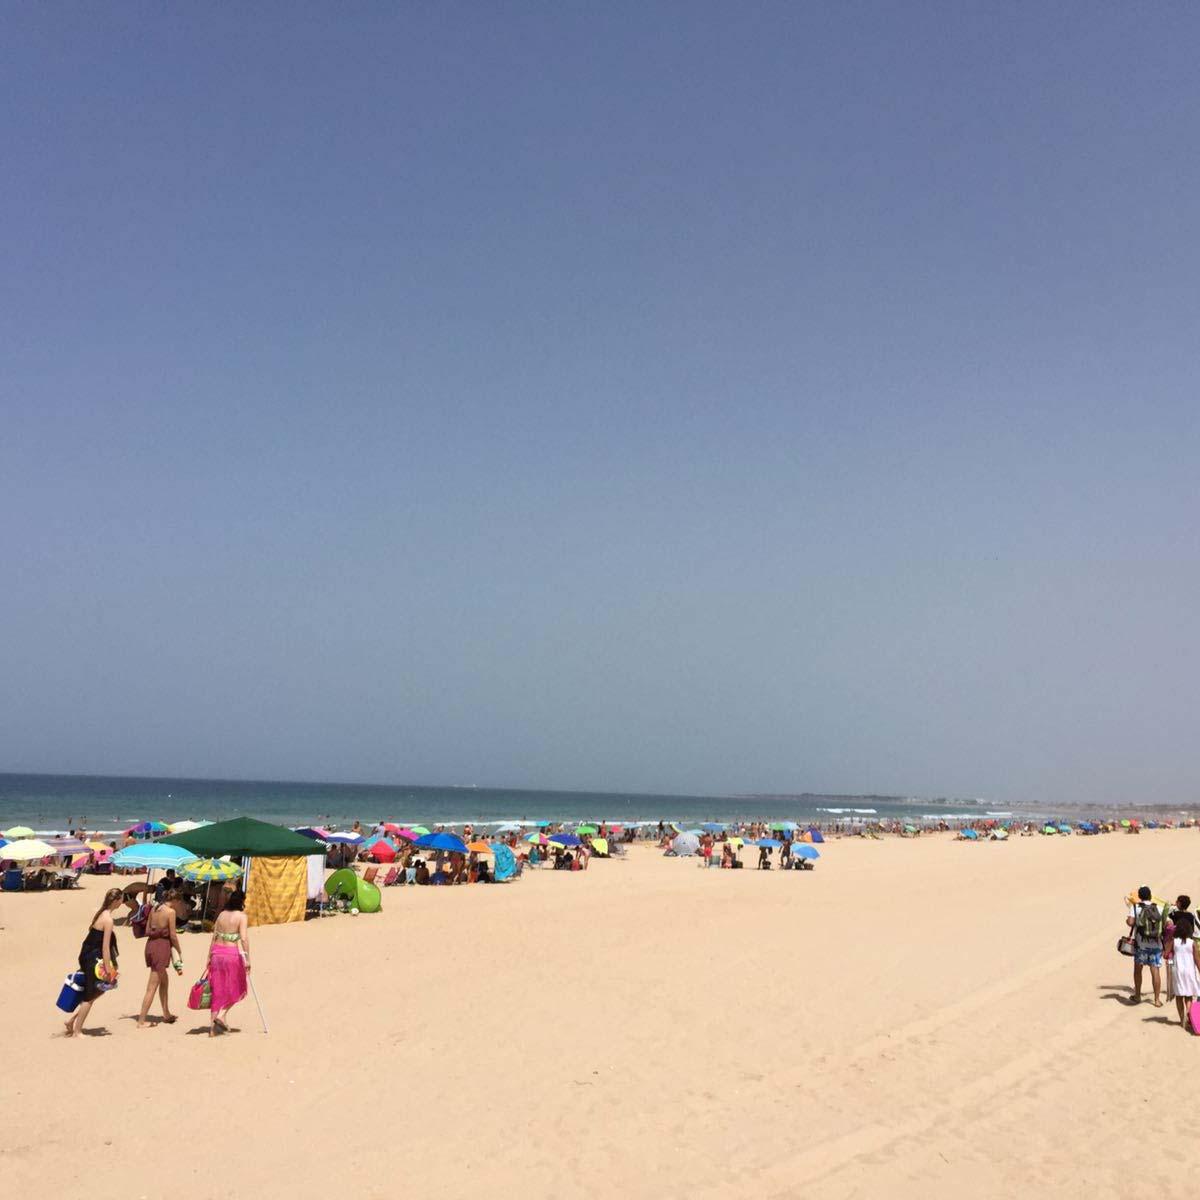 playa_sancti_petri